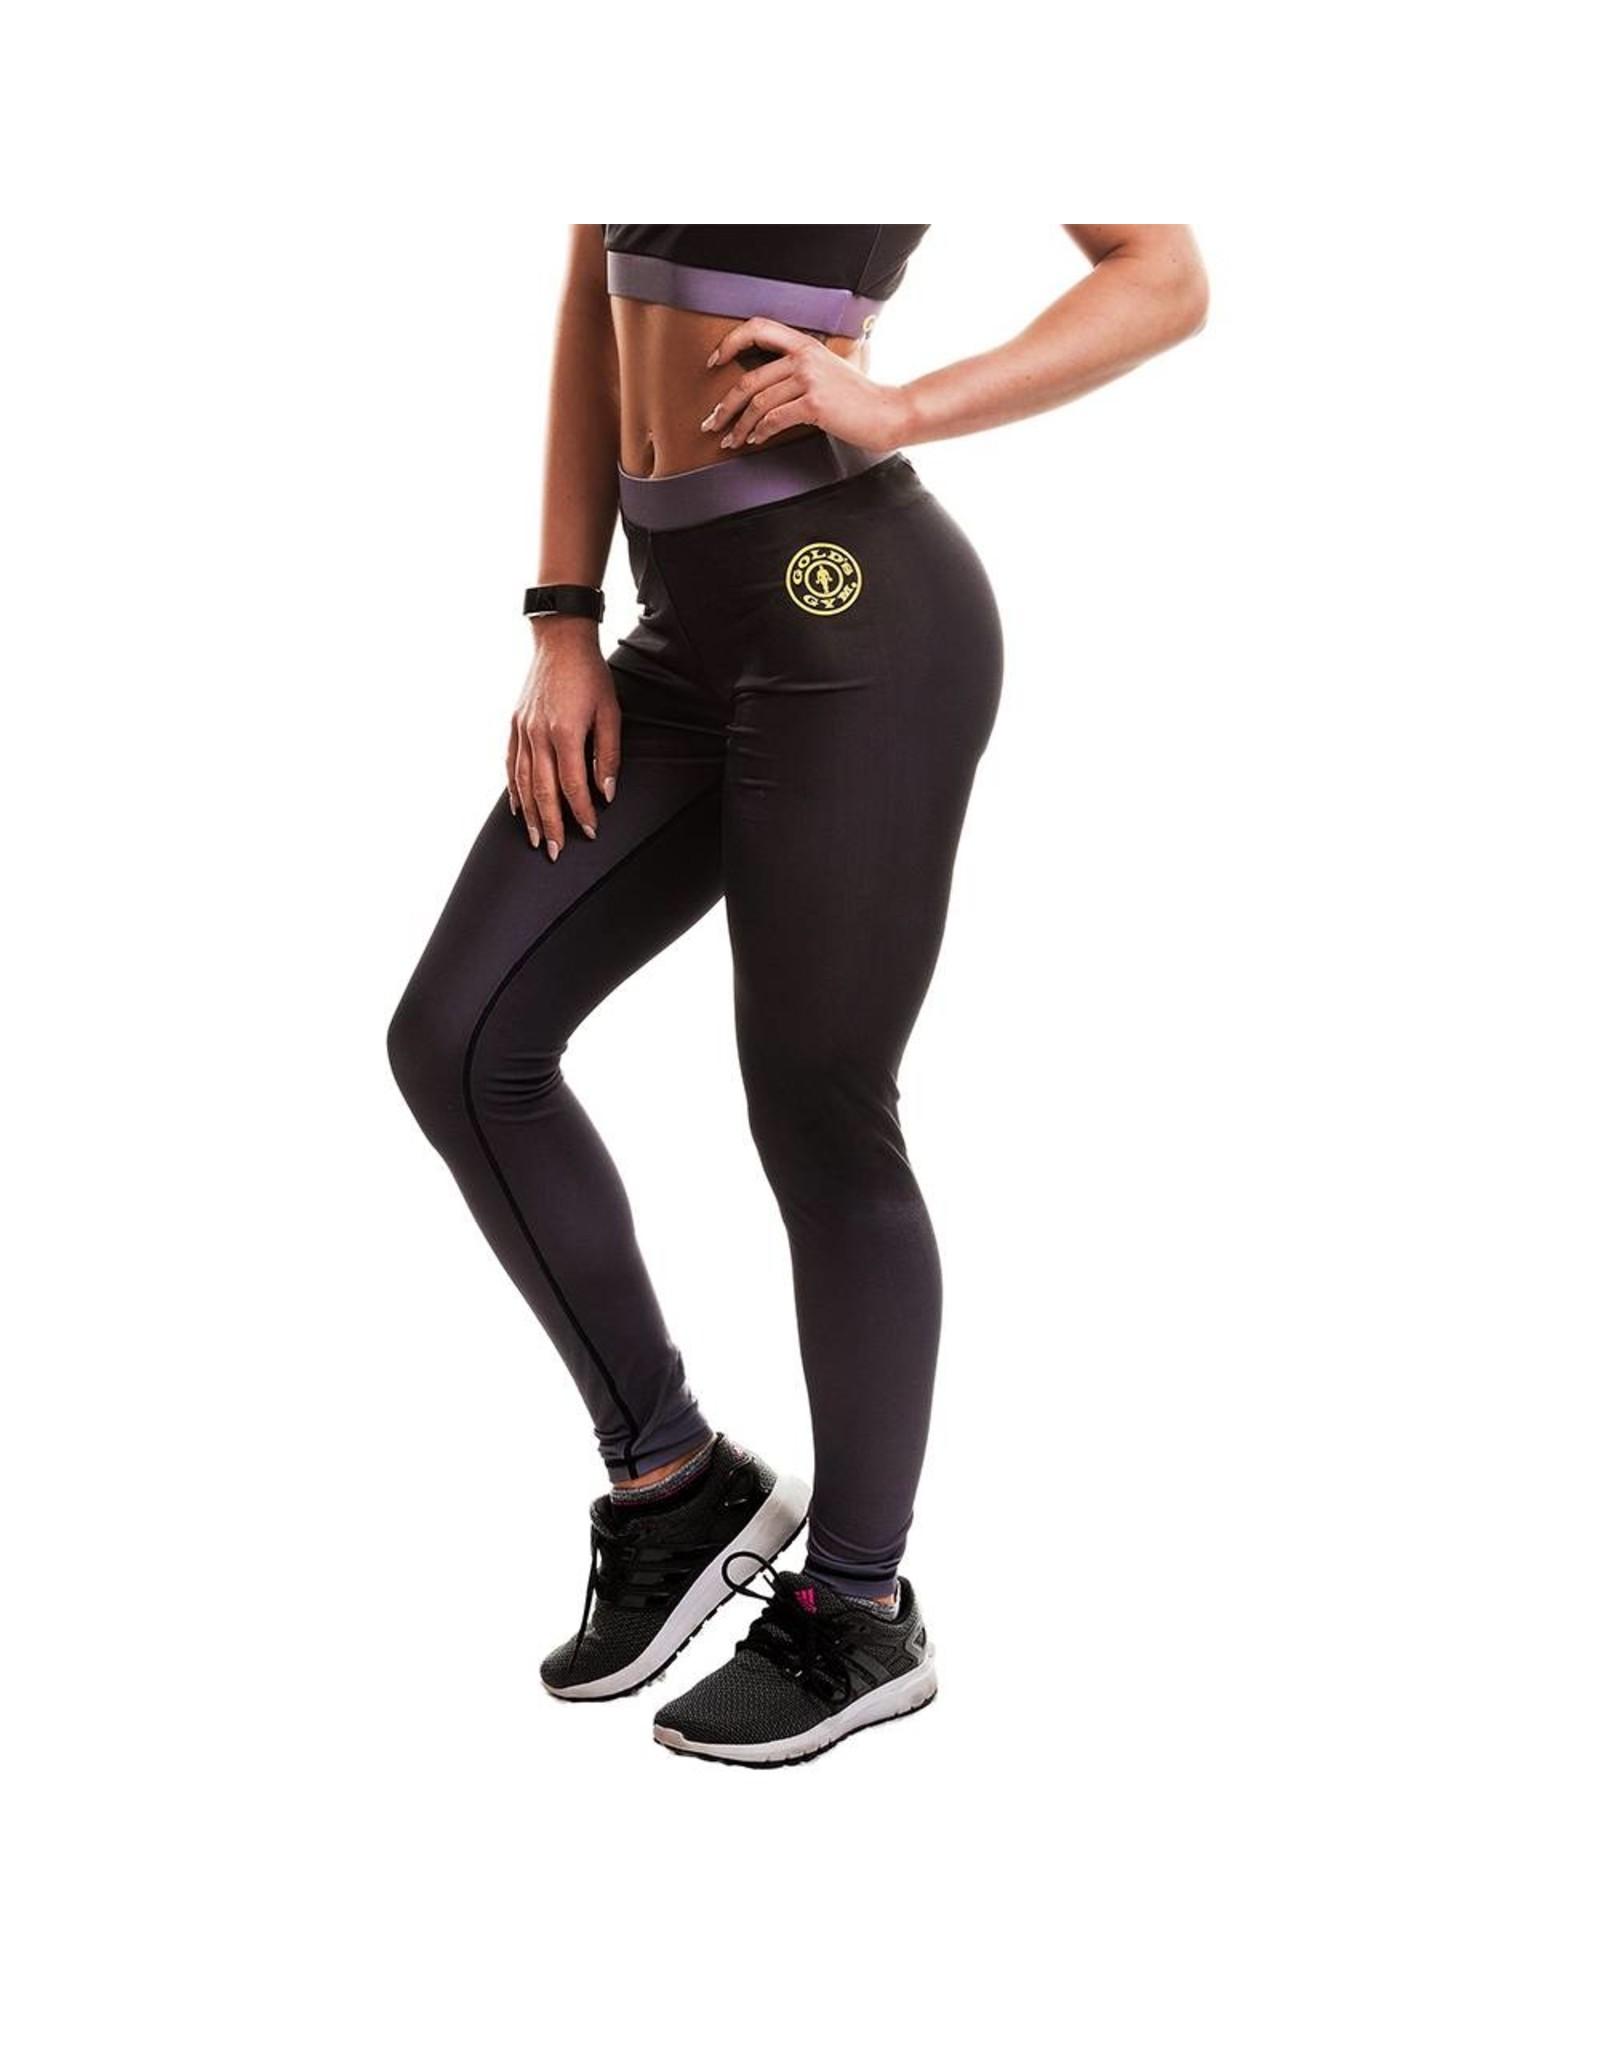 Gold's Gym Ladies Gradient Sublimated Gym Leggings - Black